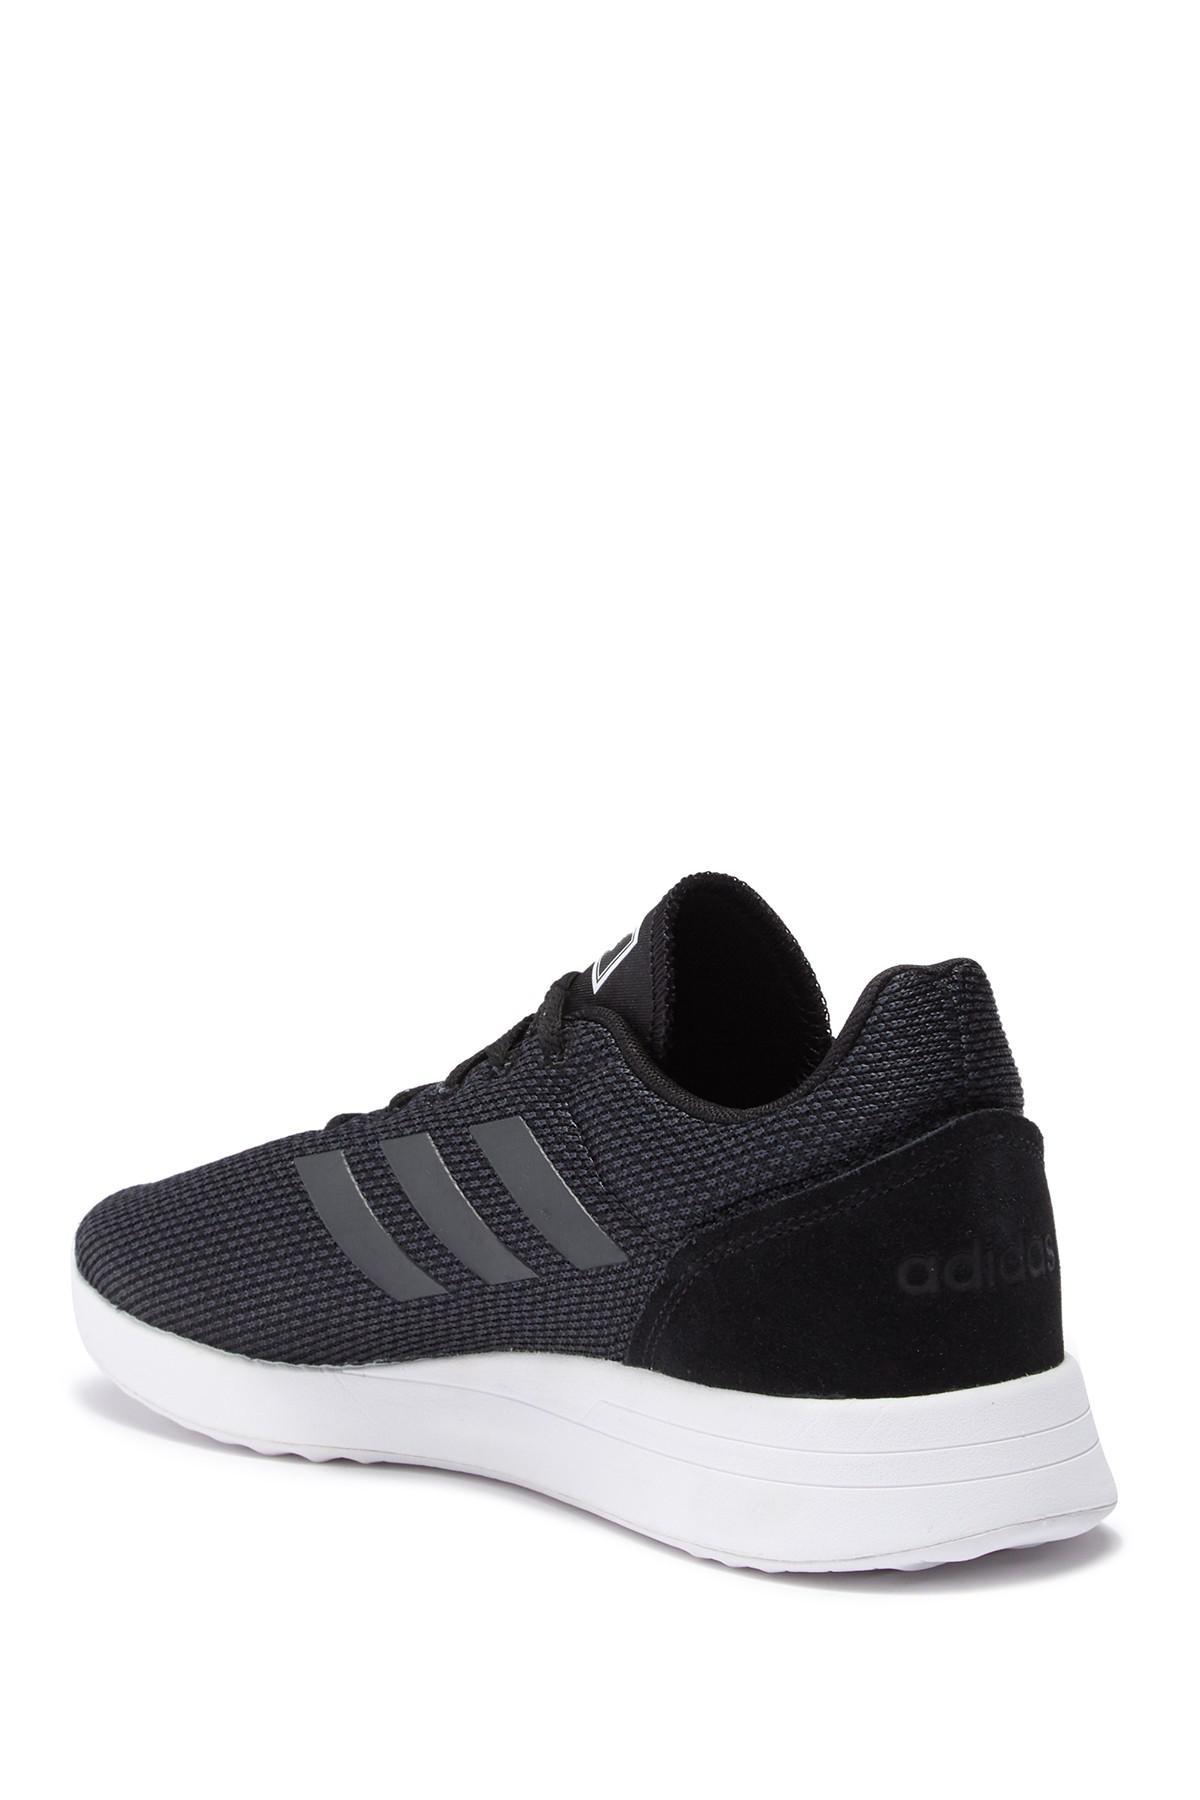 f2054d0a8a2 Adidas - Black Run 70s - Lyst. View fullscreen